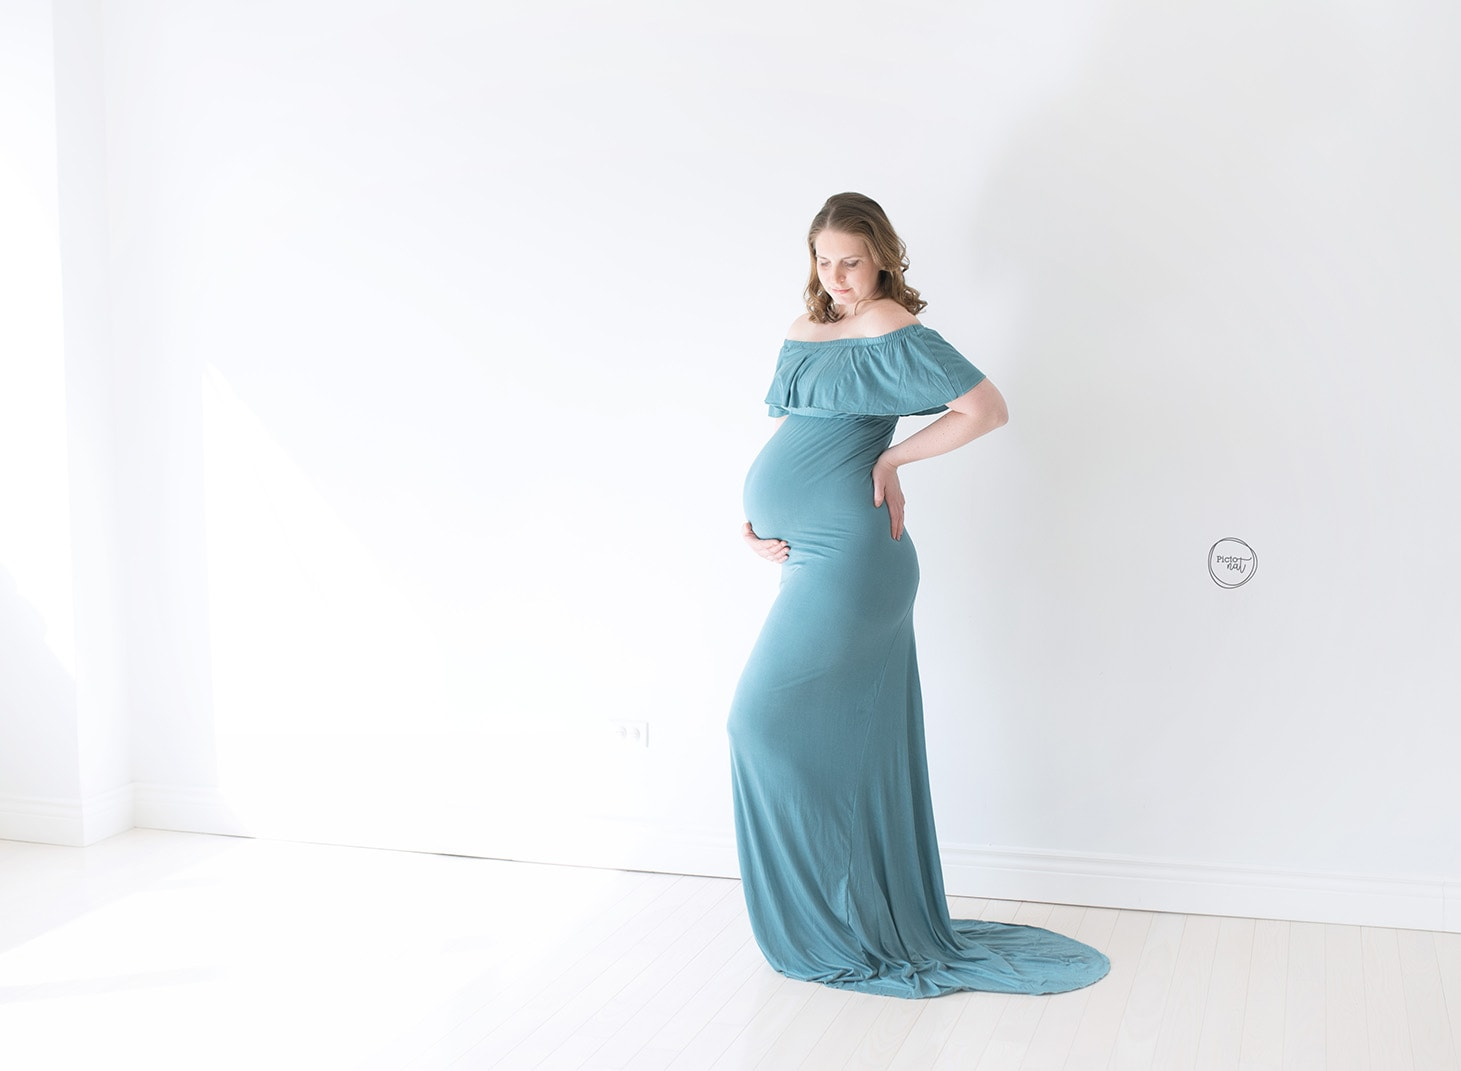 Pictonat_MaternityEvent_032218_0209-web